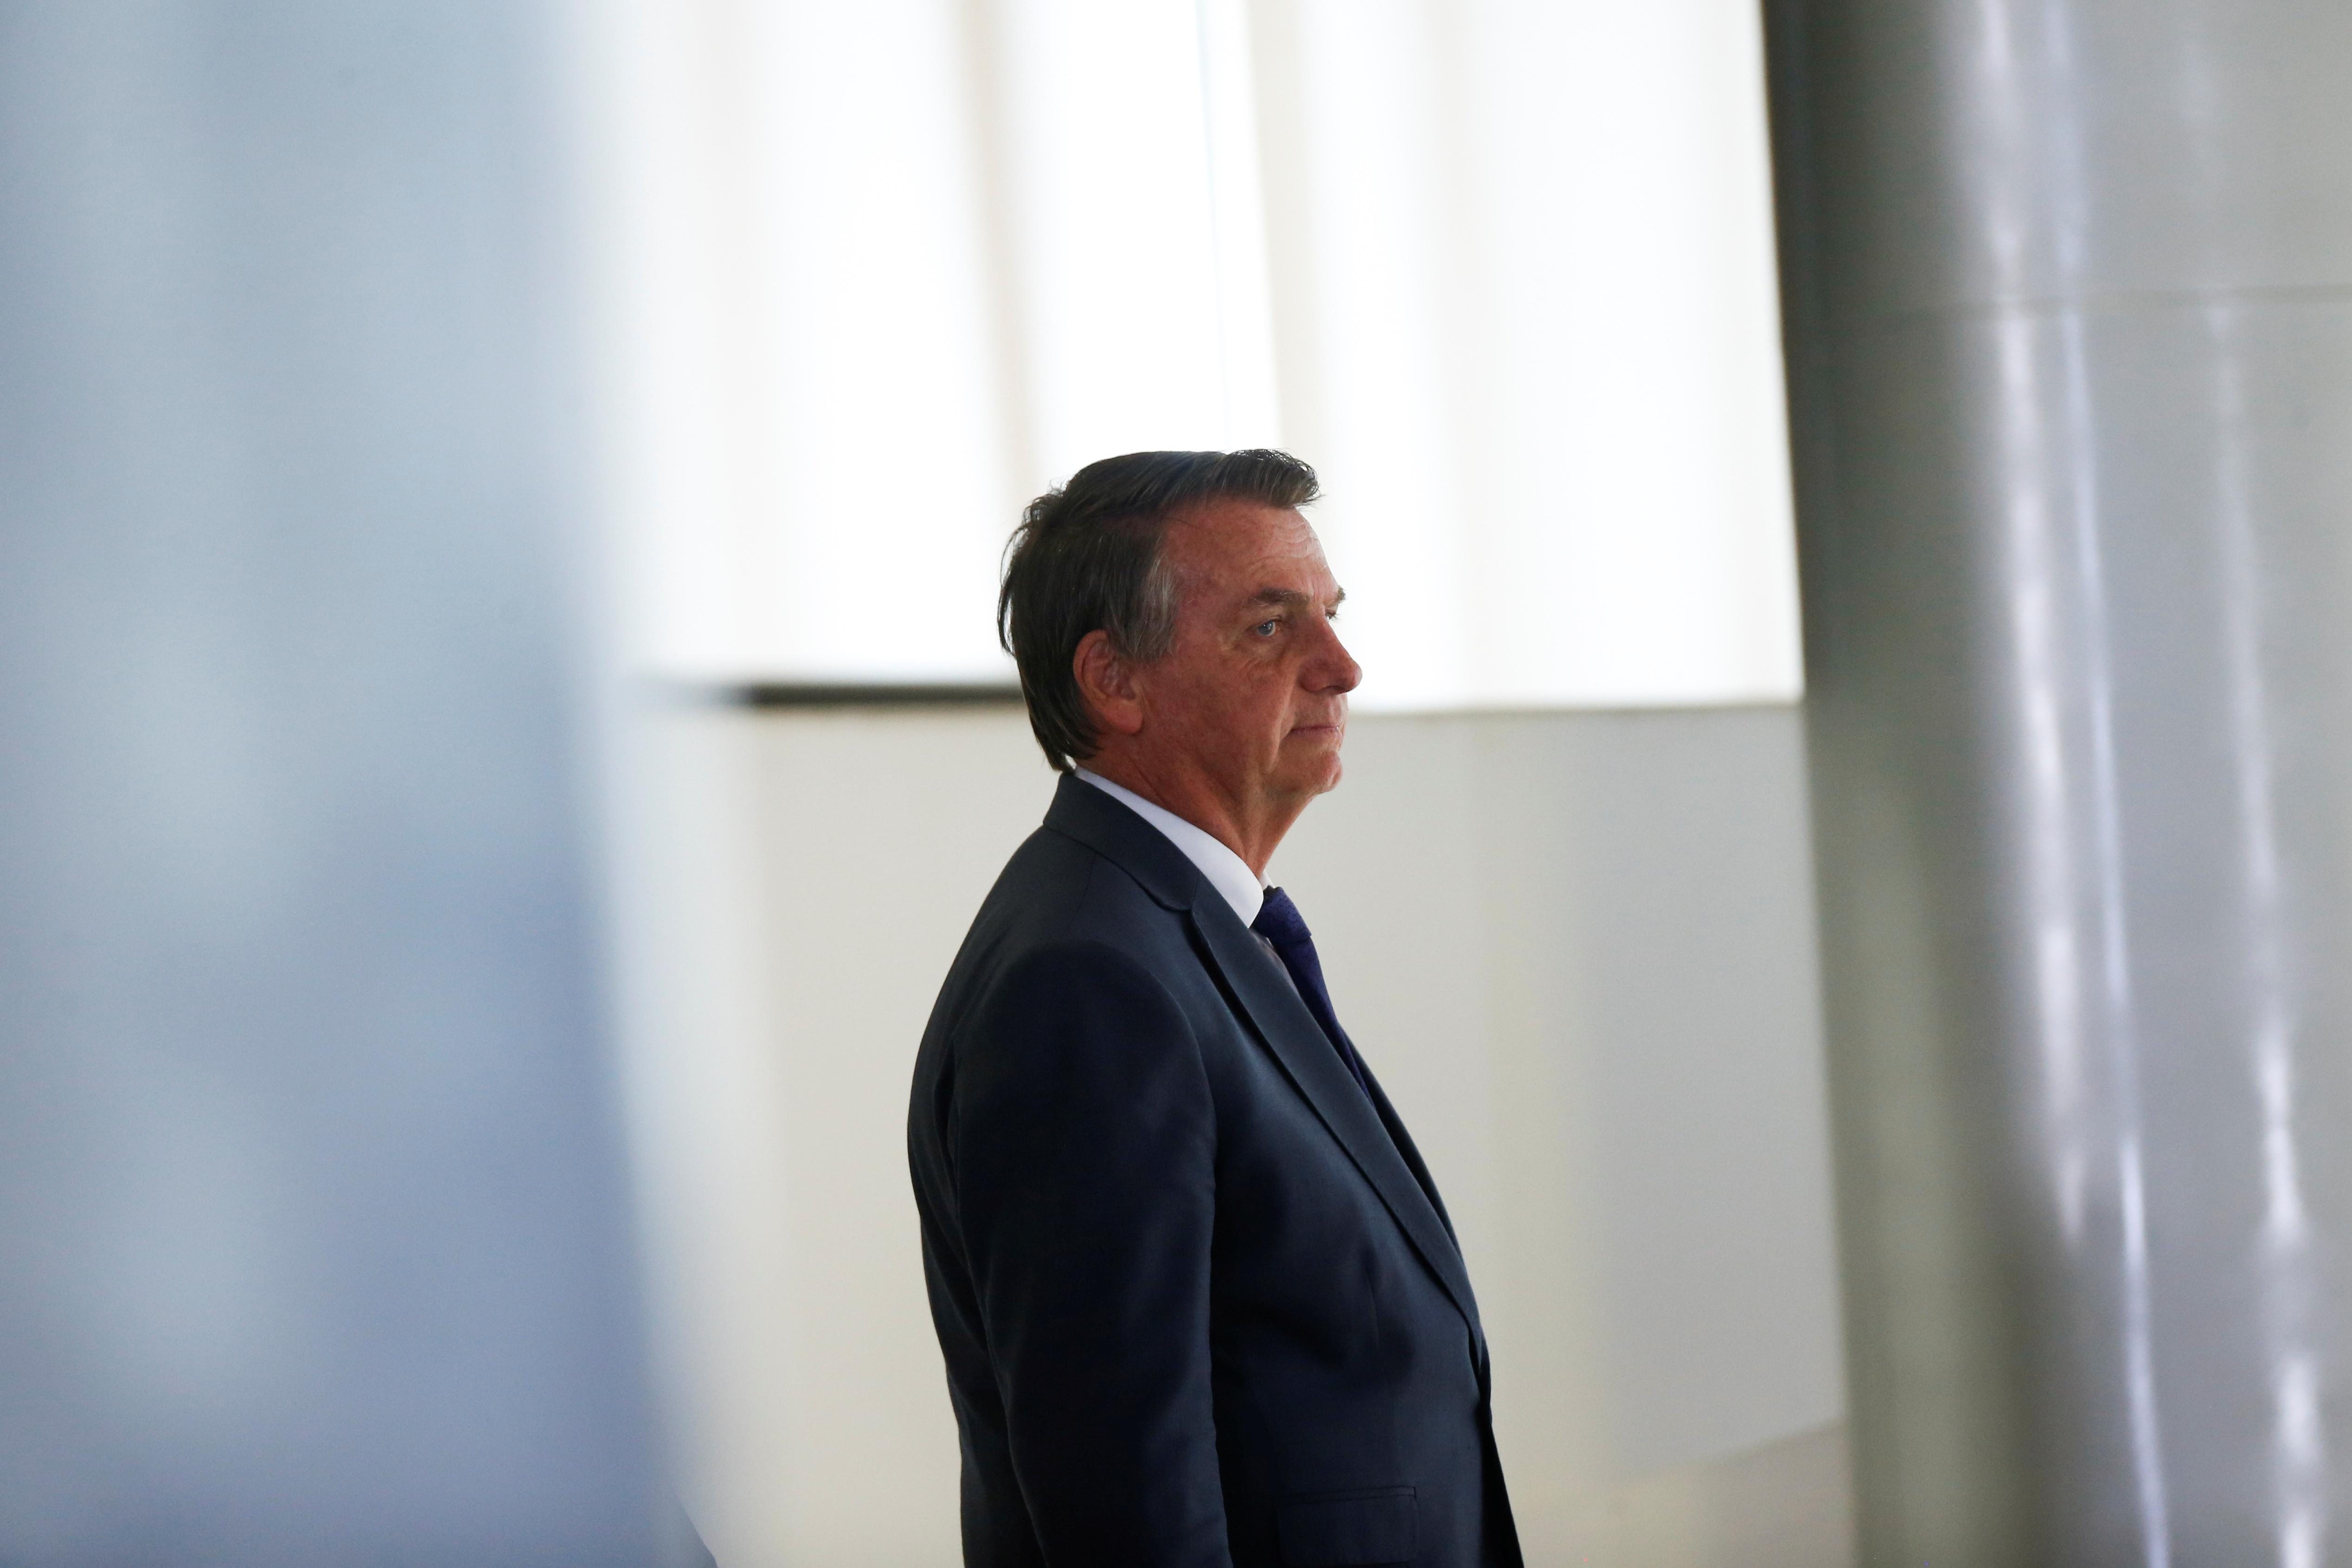 Brazil's President Jair Bolsonaro walks before a ceremony at the Planalto Palace in Brasilia, Brazil September 2, 2021. REUTERS/Adriano Machado